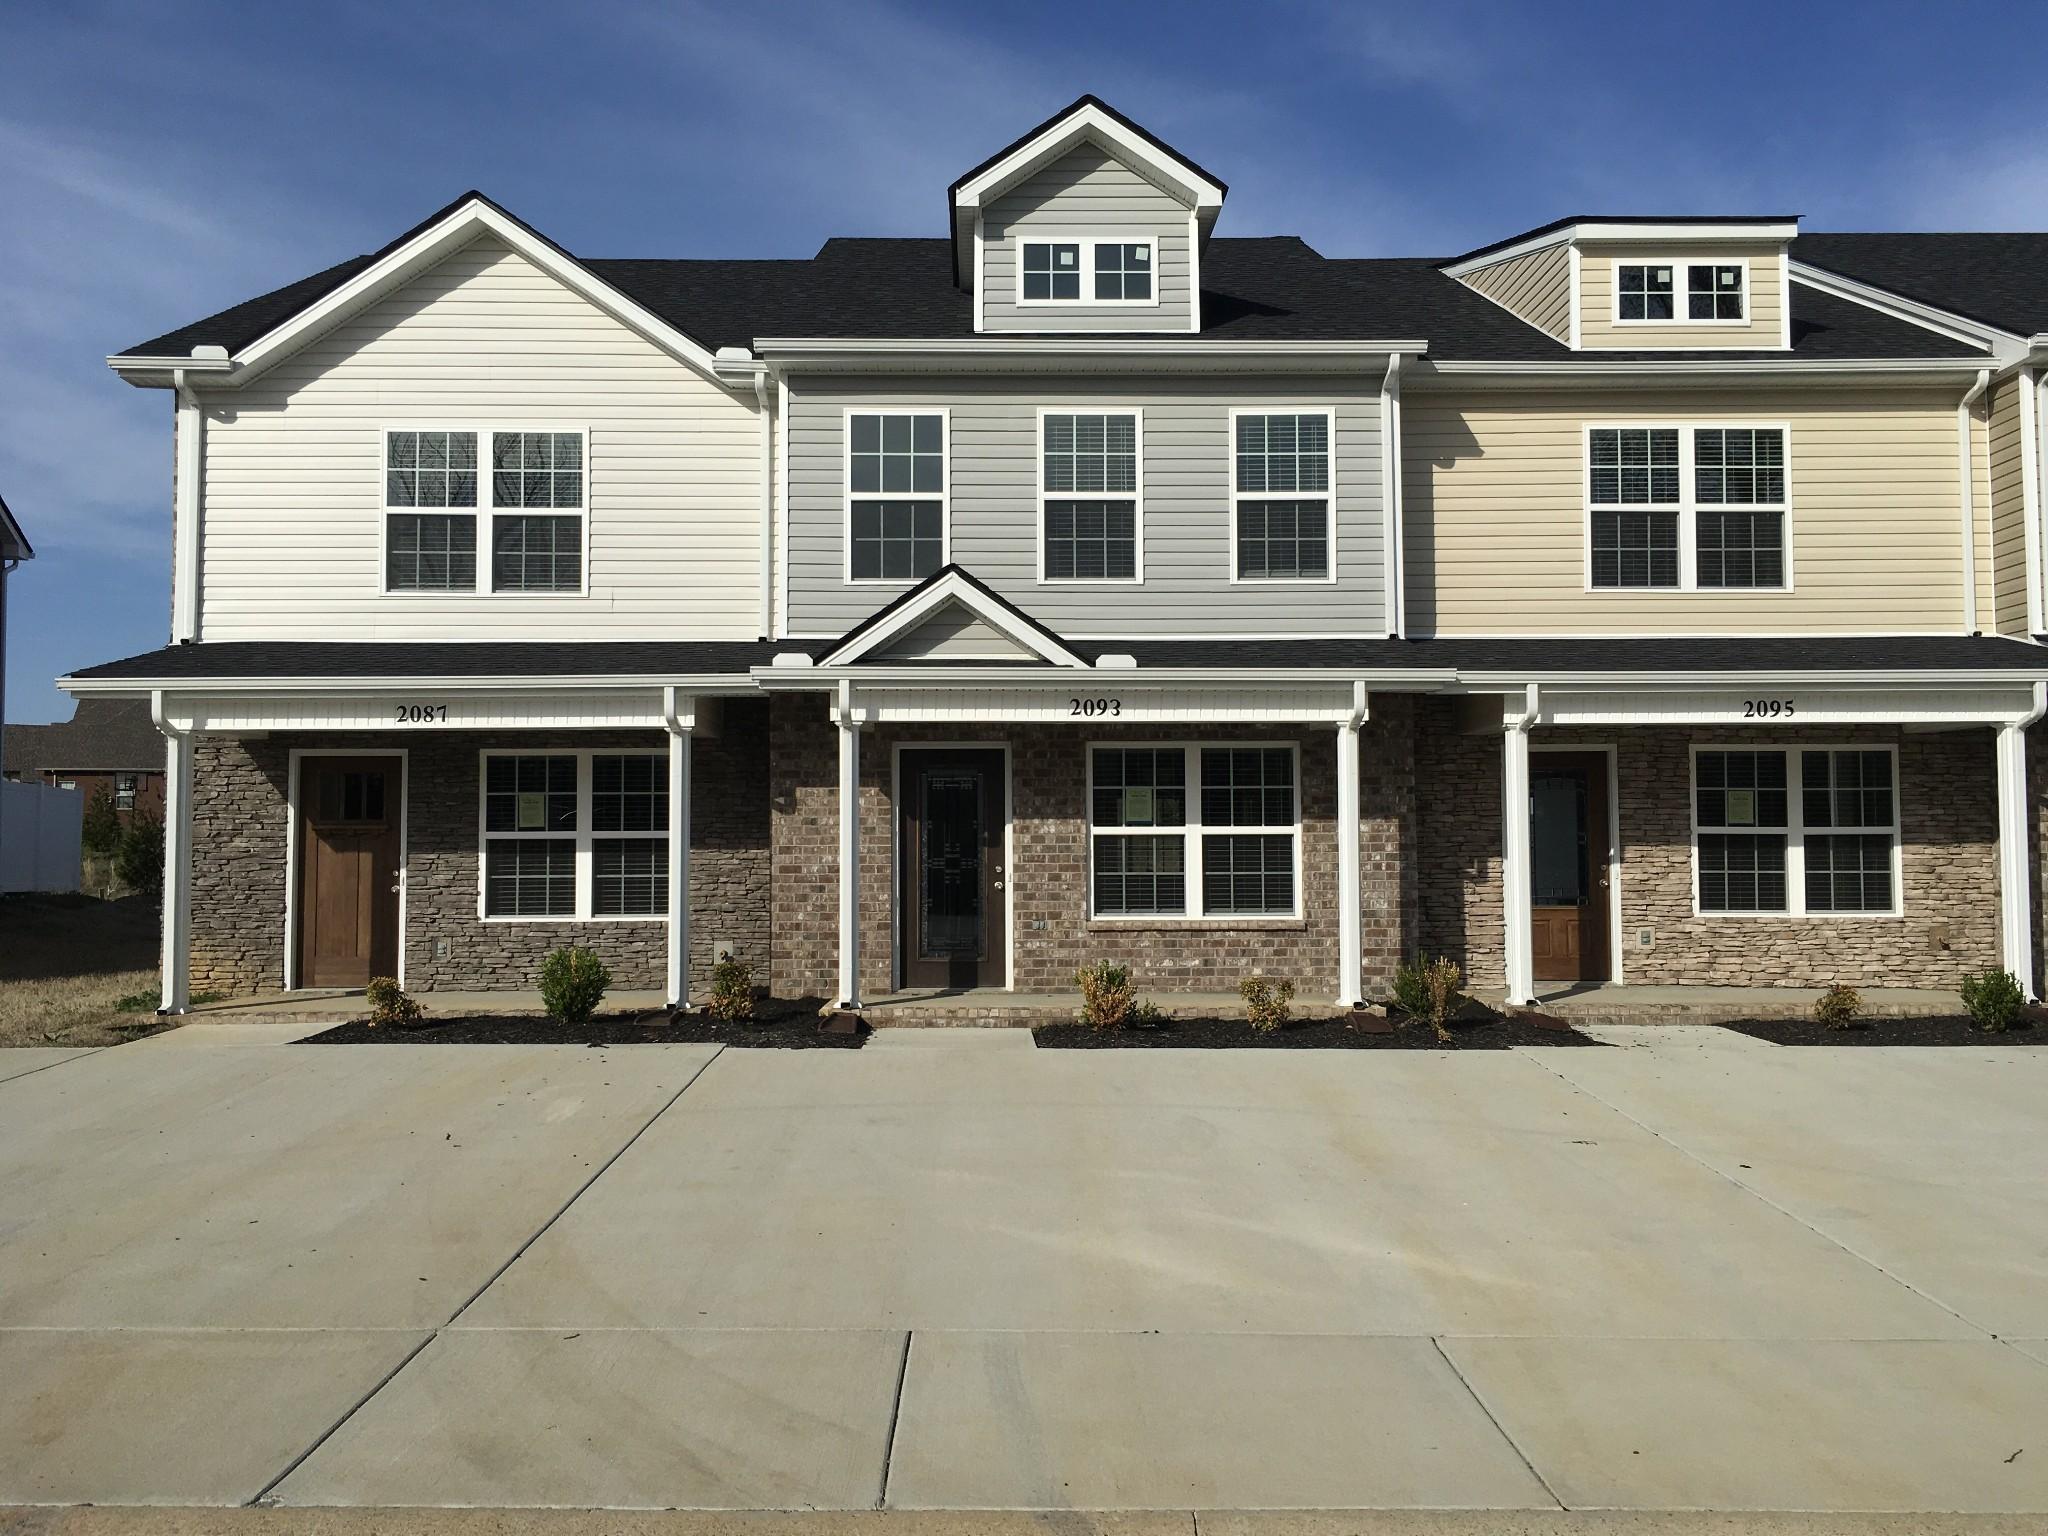 20 Unit 20 Downstream, Ashland City, TN 37015 - Ashland City, TN real estate listing